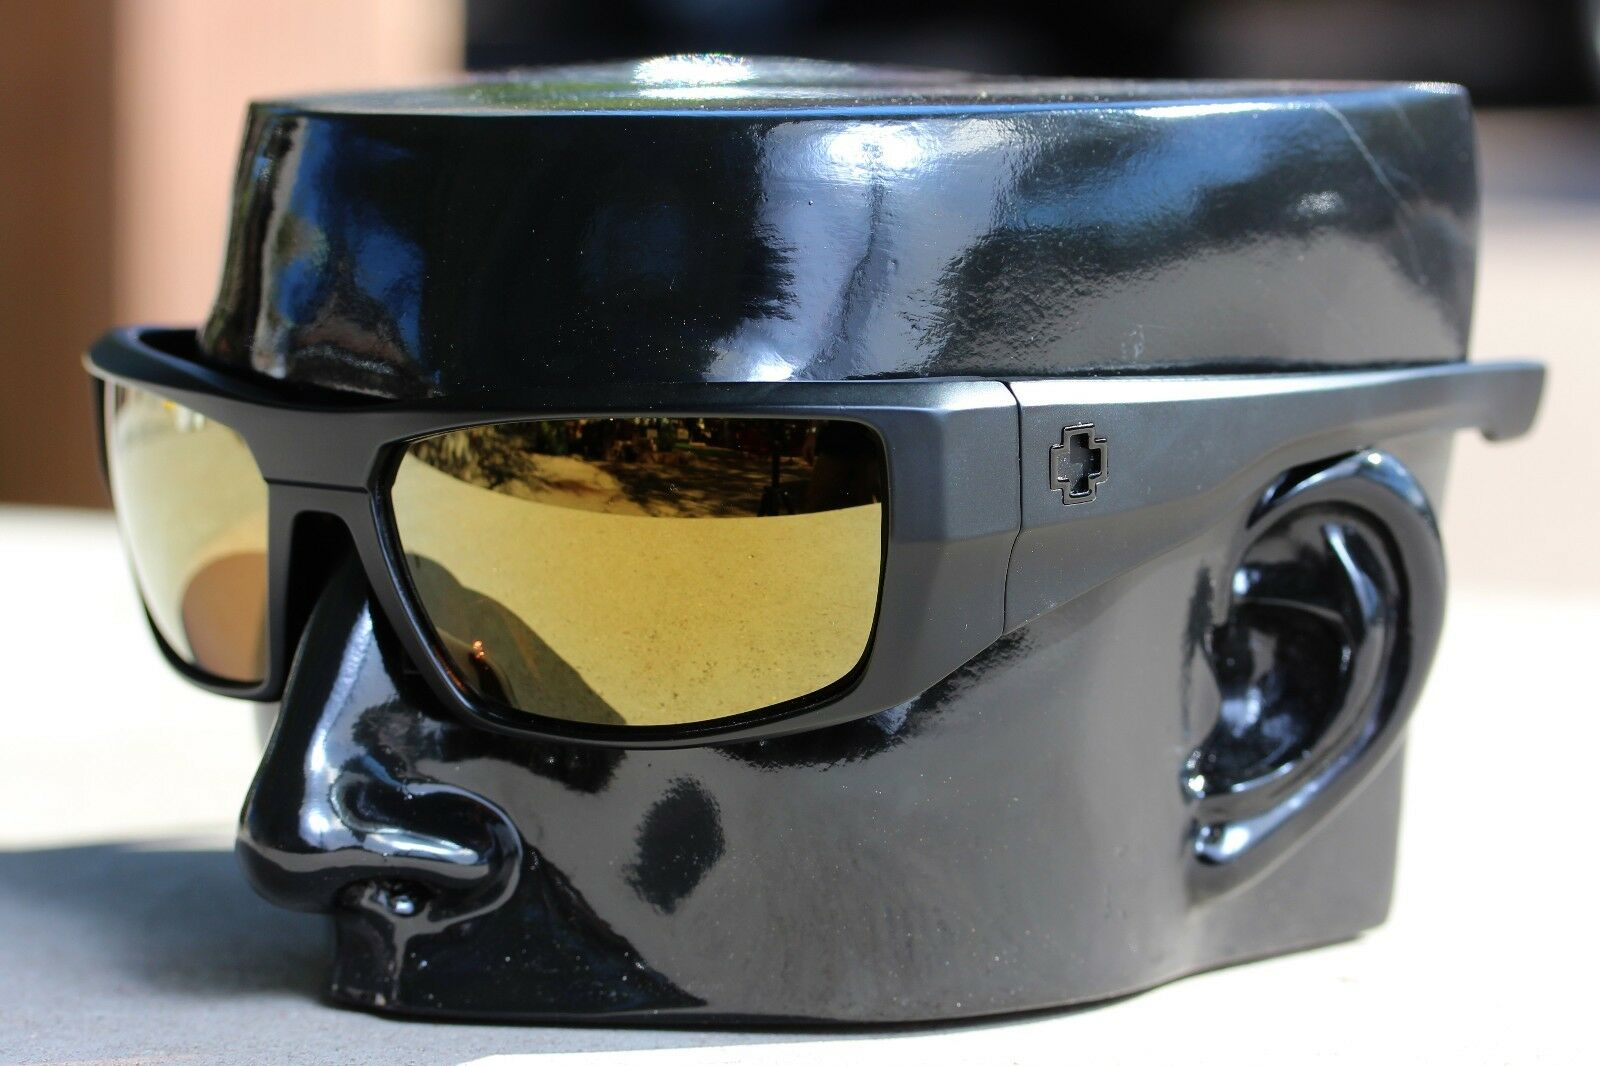 71555dbf0993e Polarized Ikon Replacement Lenses for Spy Optic Dirk Sunglasses 24k ...